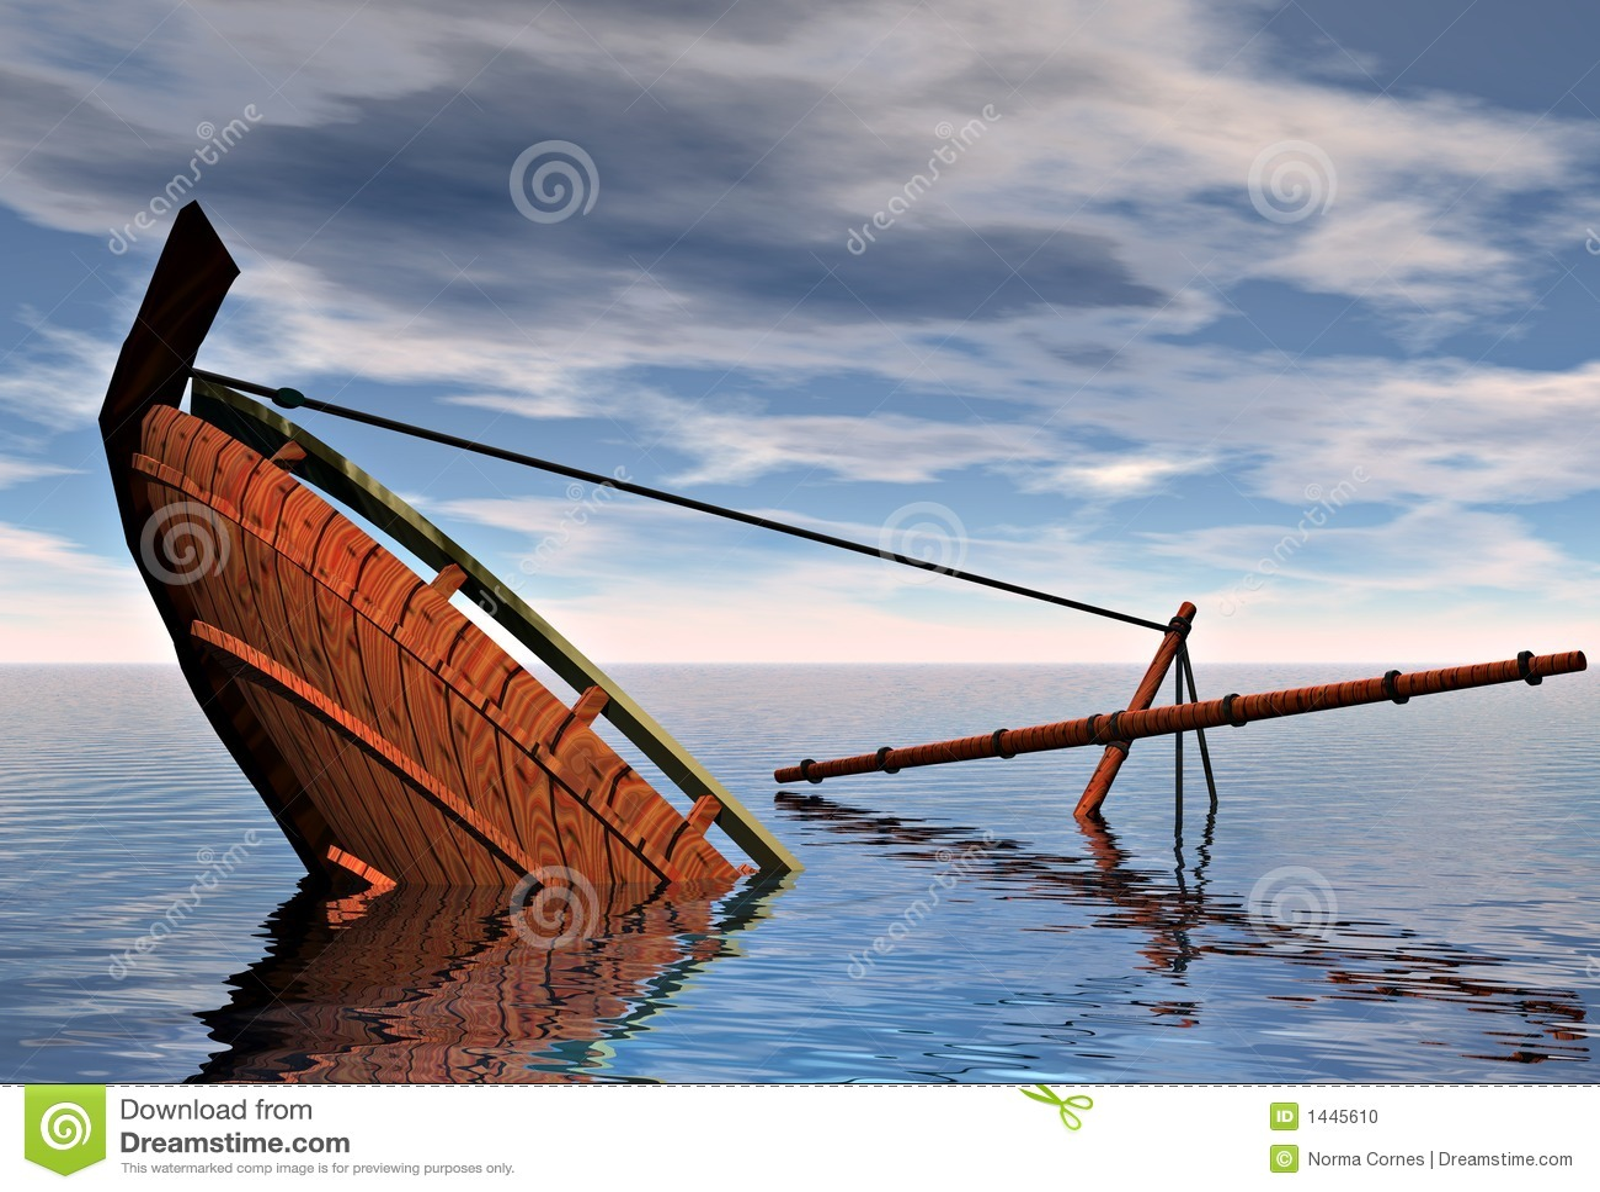 Sinking ship stock illustration. Image of stunning, summer - 1445610